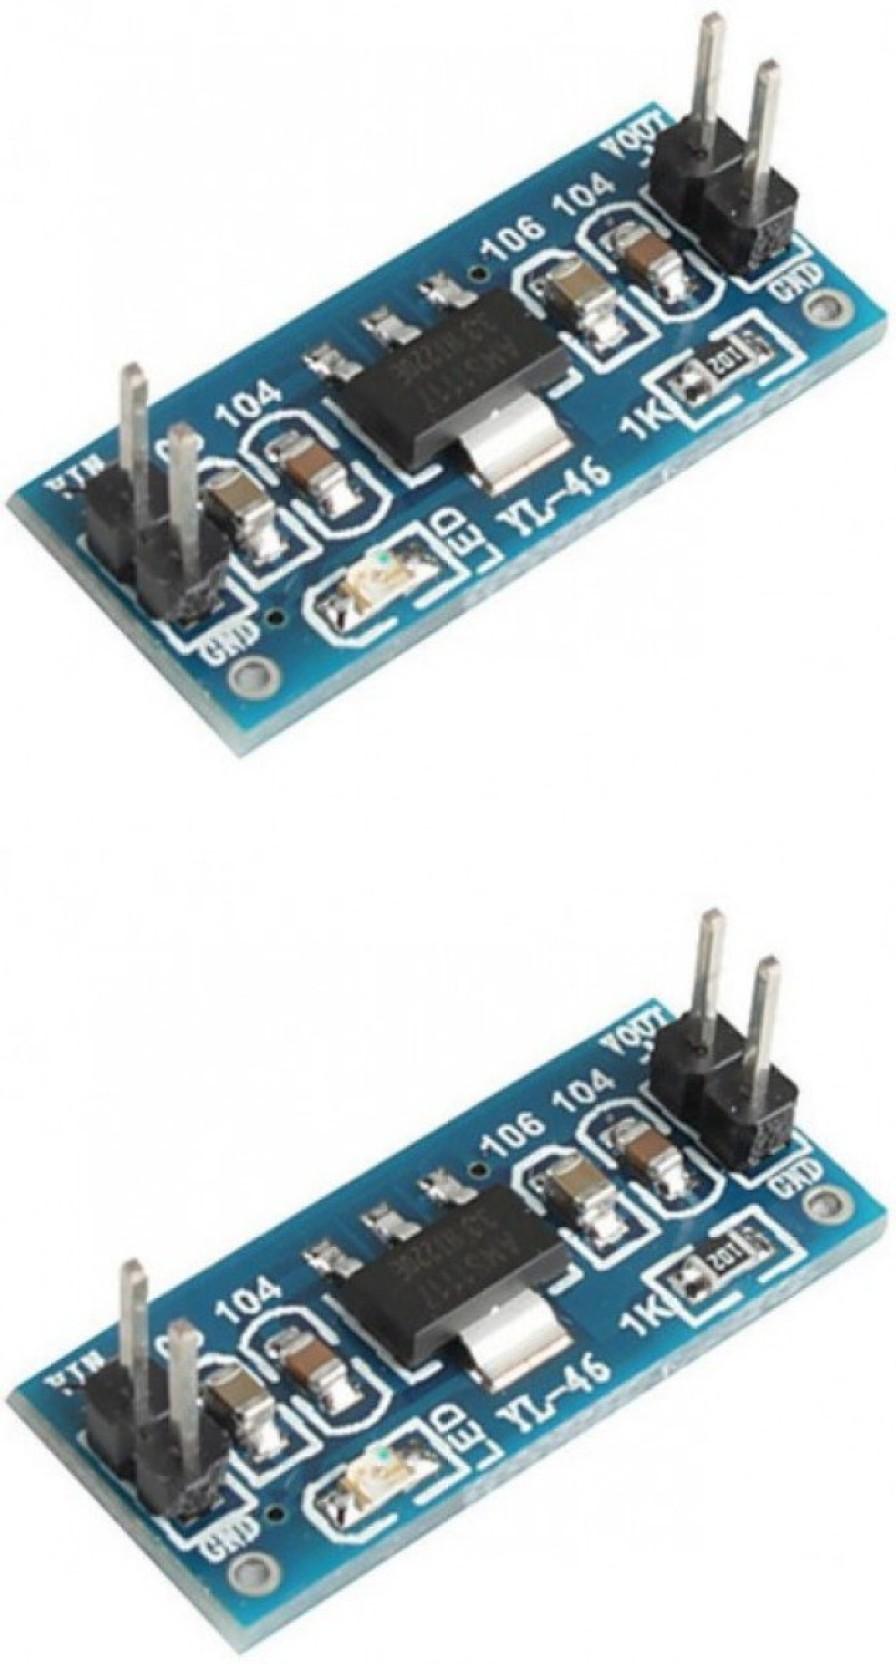 Kitsguru Dc Step Down Voltage Regulator 5 Volt Power Supply Circuit Adapter Ams1117 5v Add To Cart